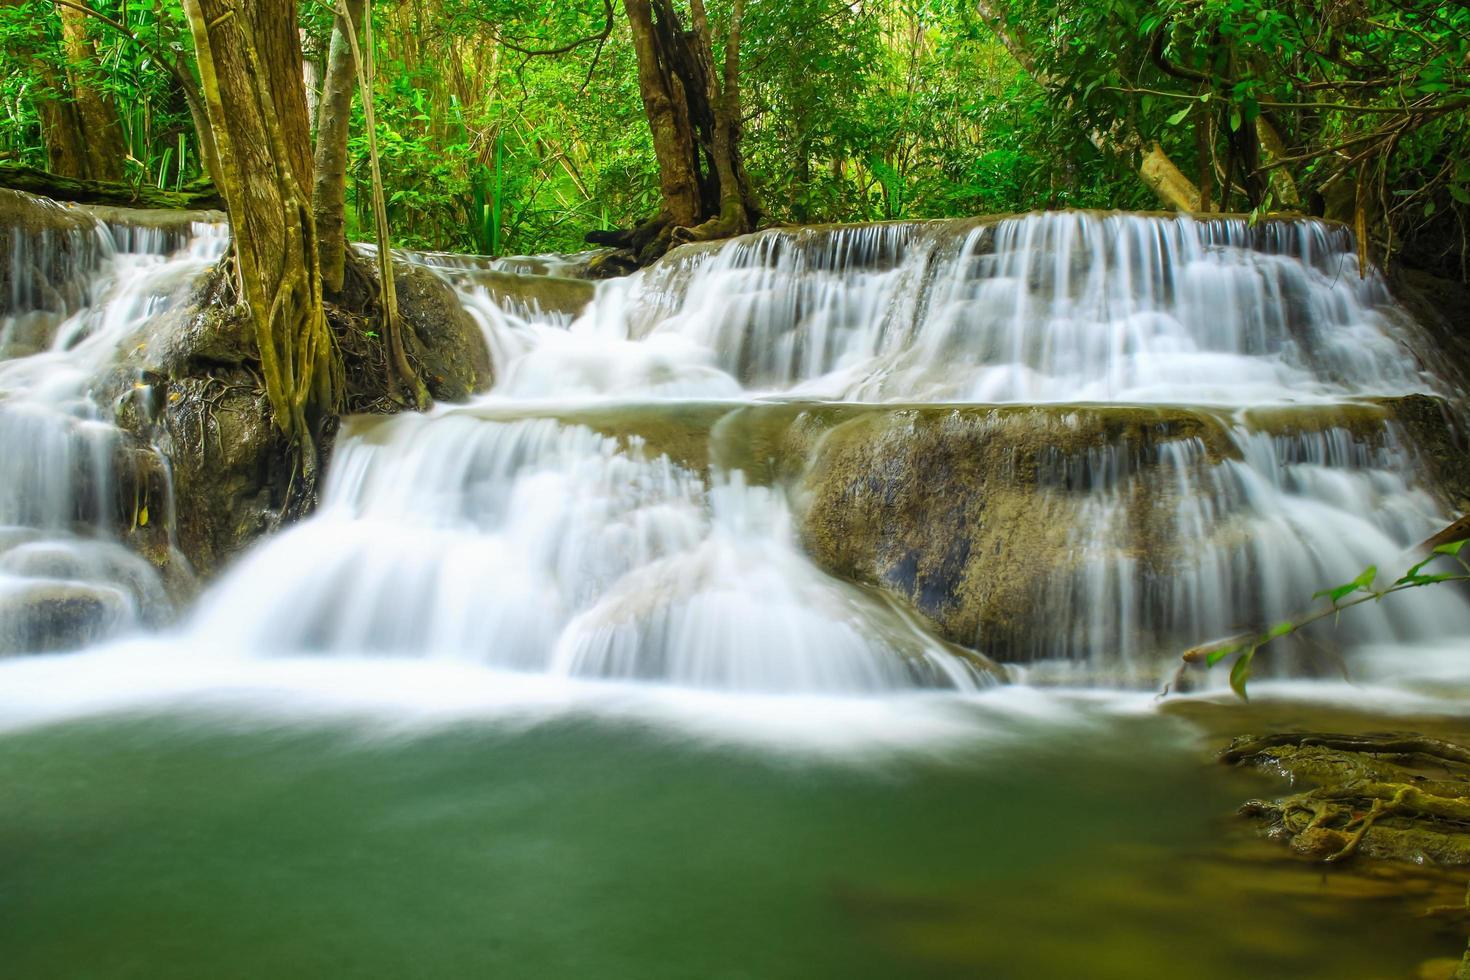 Huai Mae Khamin Waterfall in a forest photo